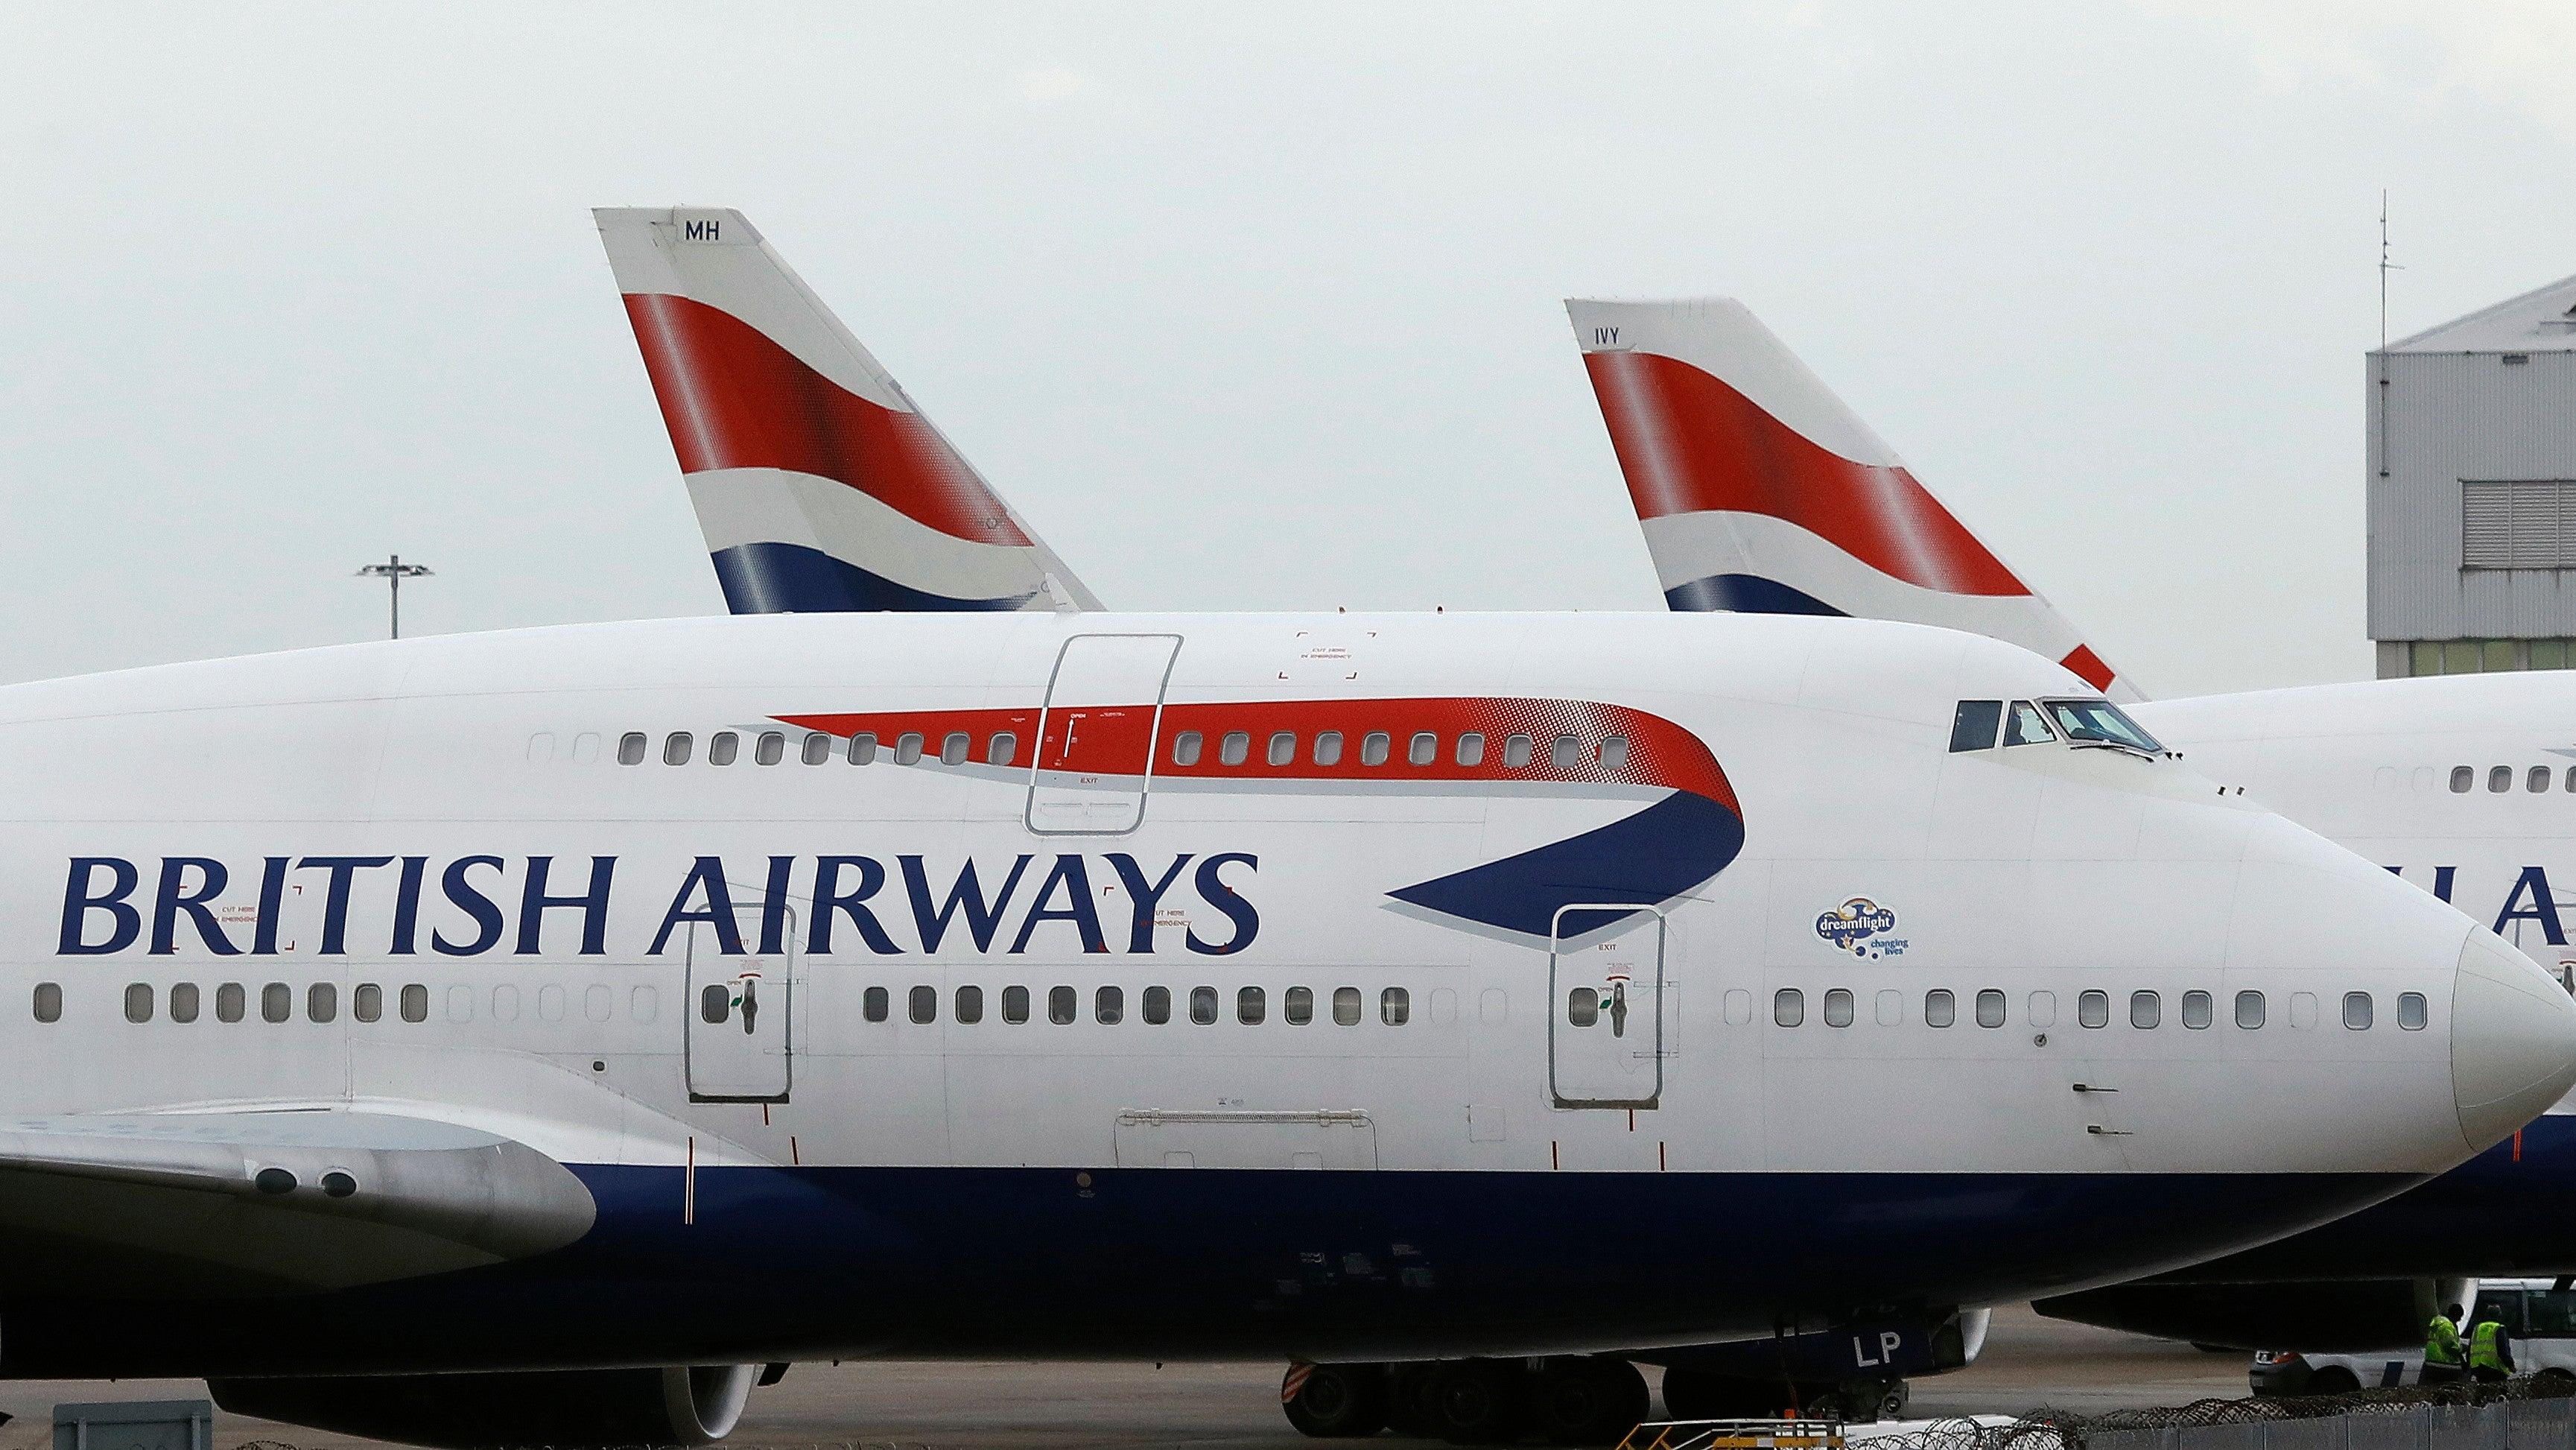 British Airways Faces Record $229 Million Penalty Over Stolen Customer Data